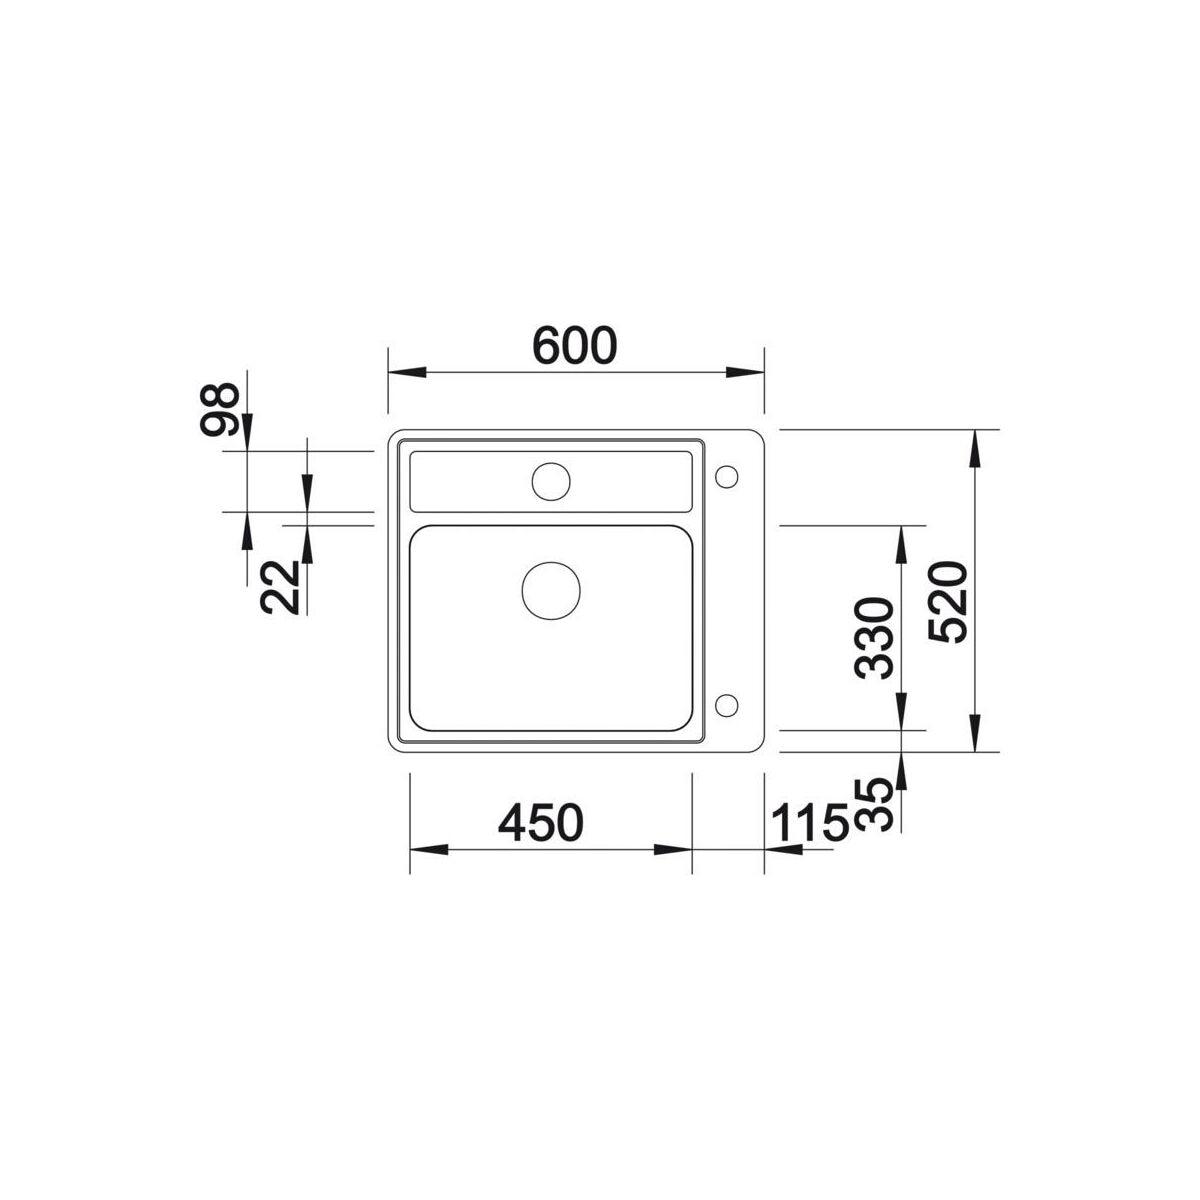 zlewozmywak statura 6 if crystal blanco sprawd opinie w leroy merlin. Black Bedroom Furniture Sets. Home Design Ideas